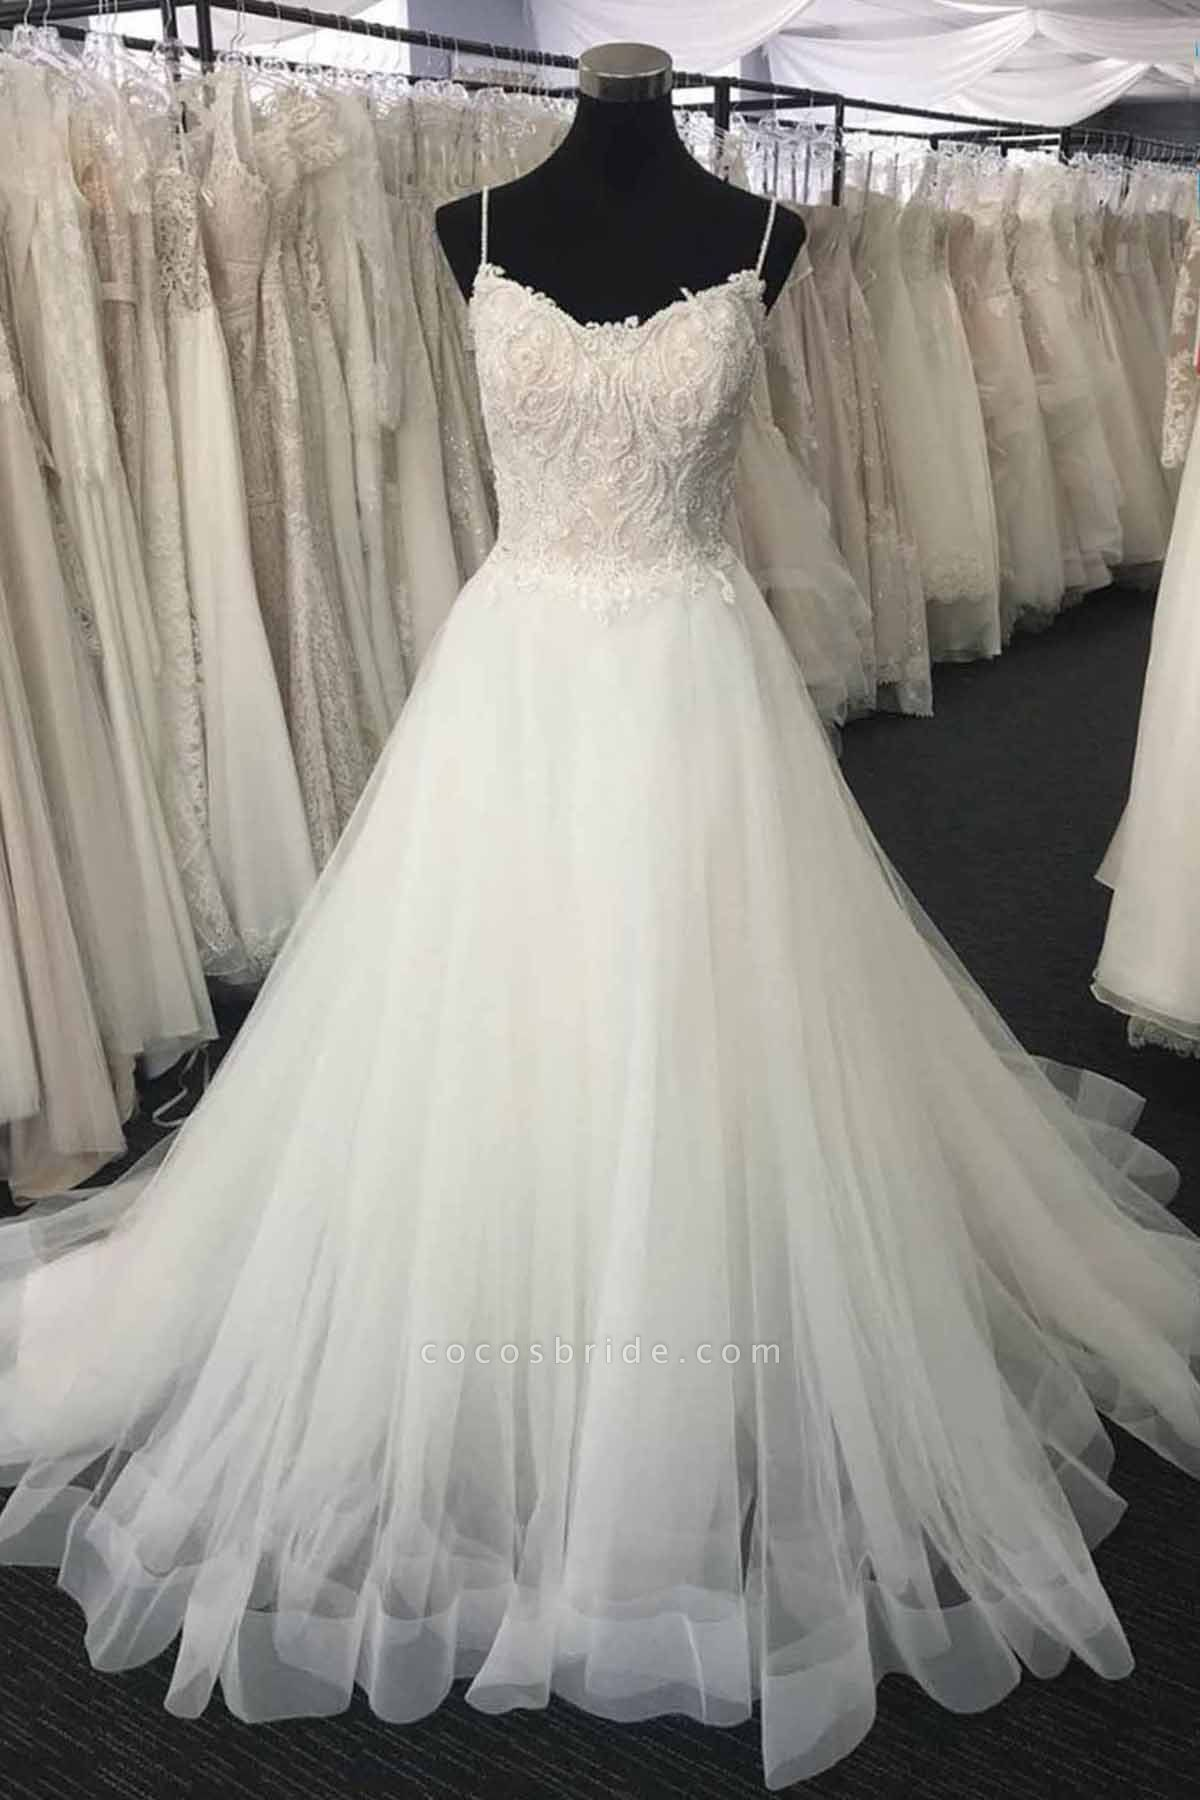 Sweetheart Neck Long White Lace Wedding Dress